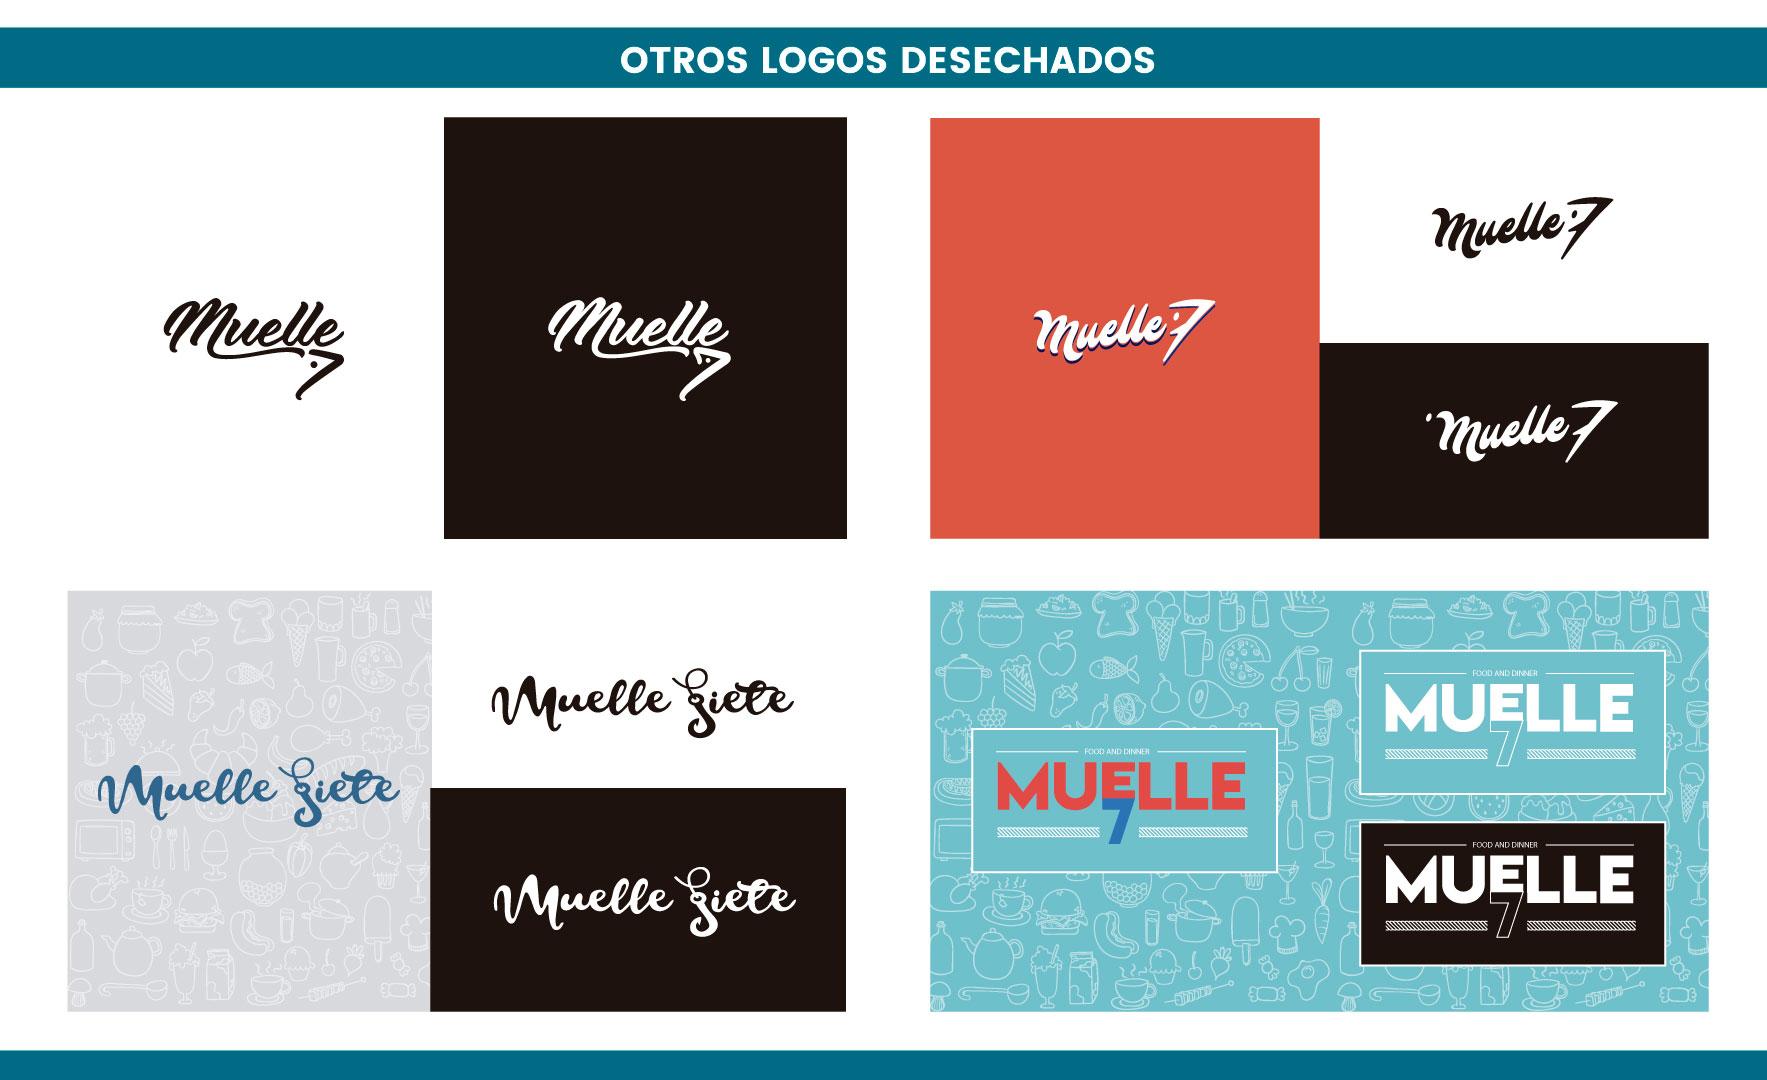 otros-logos